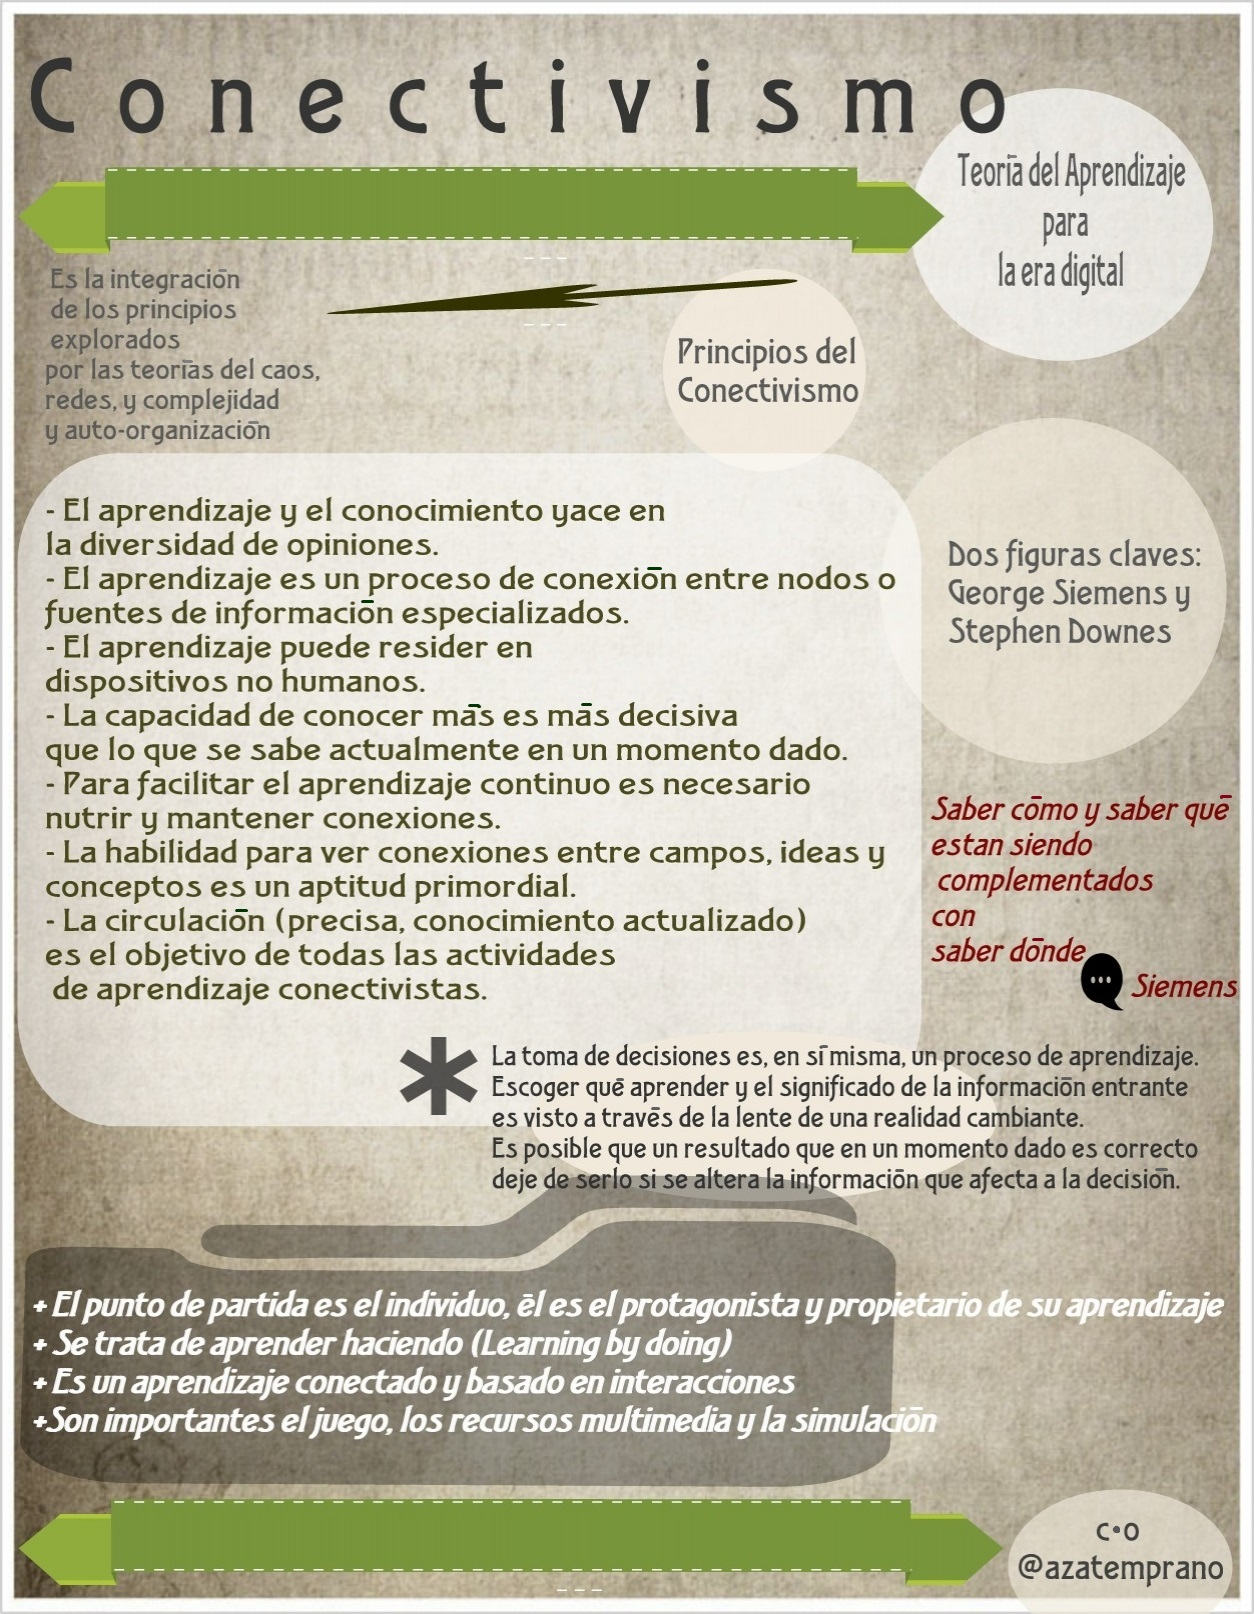 external image infografia_conectivismo_teoria_de_aprendizaje_para_la_era_digital.jpg